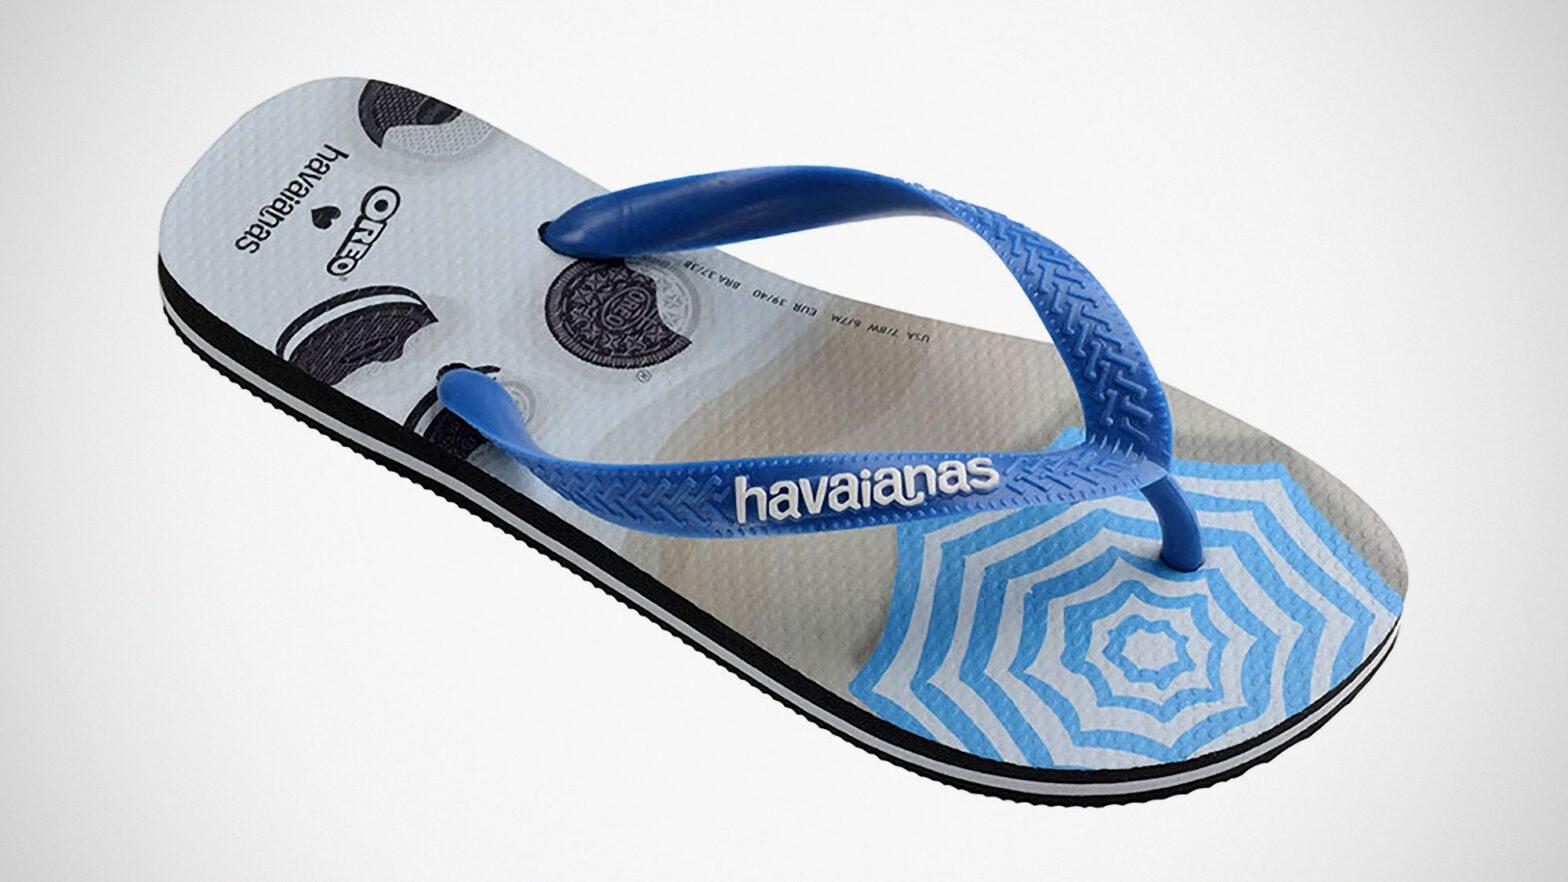 Oreo x Havaianas Top OREO-scented Flip Flops